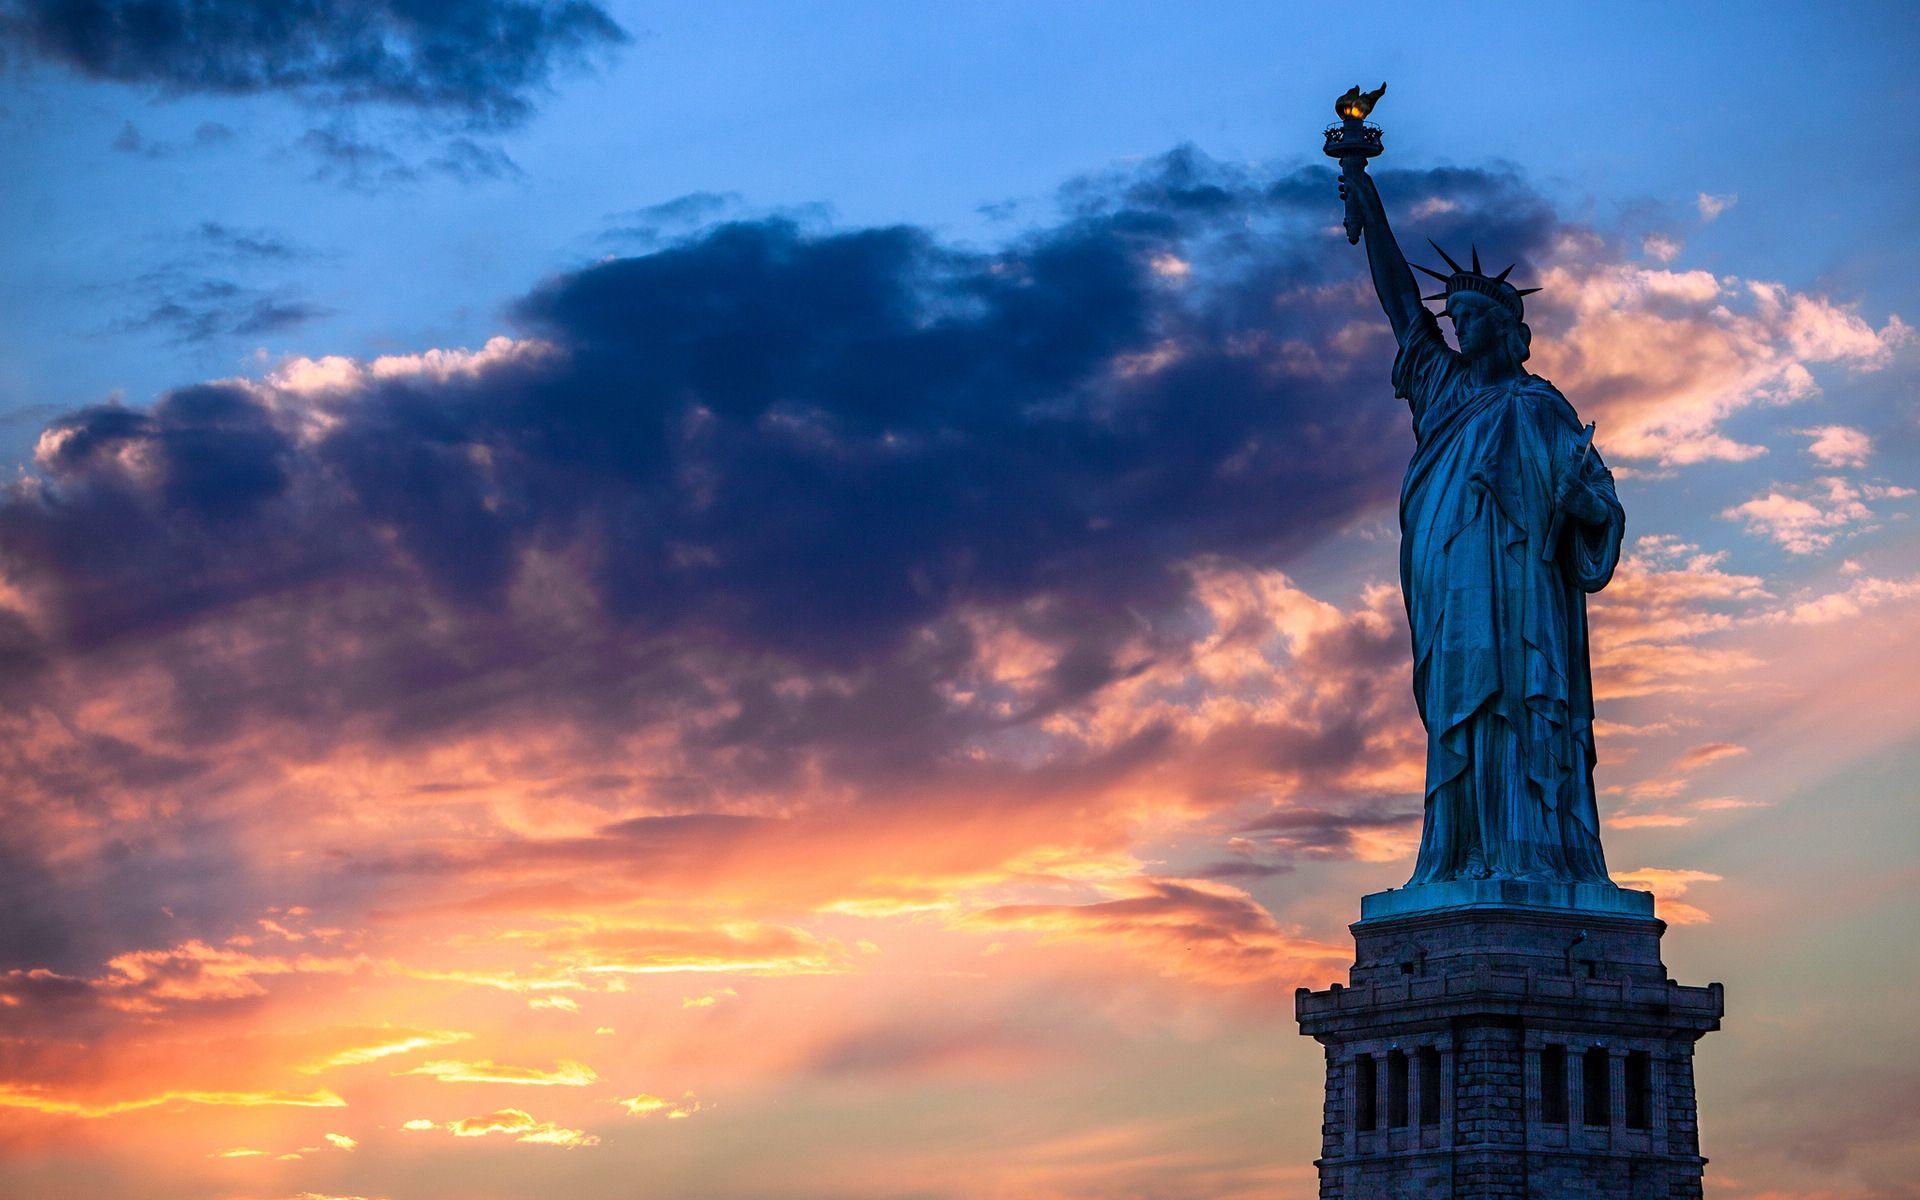 statue of liberty desktop wallpaper 48972